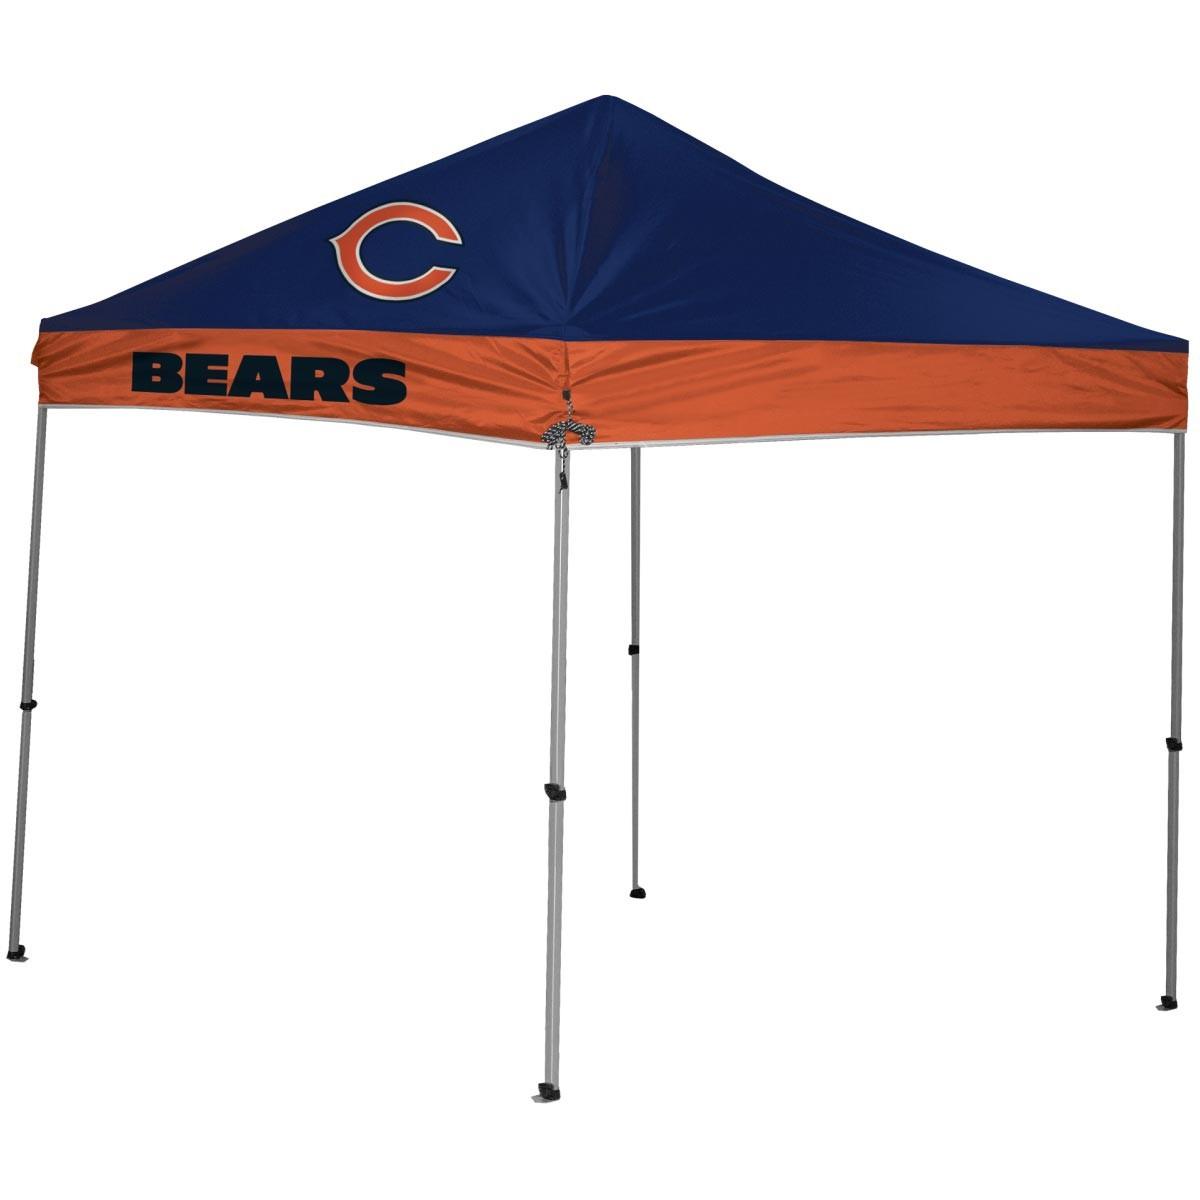 sc 1 st  Anthem Sports & Chicago Bears NFL 9x9 Straight Leg Canopy